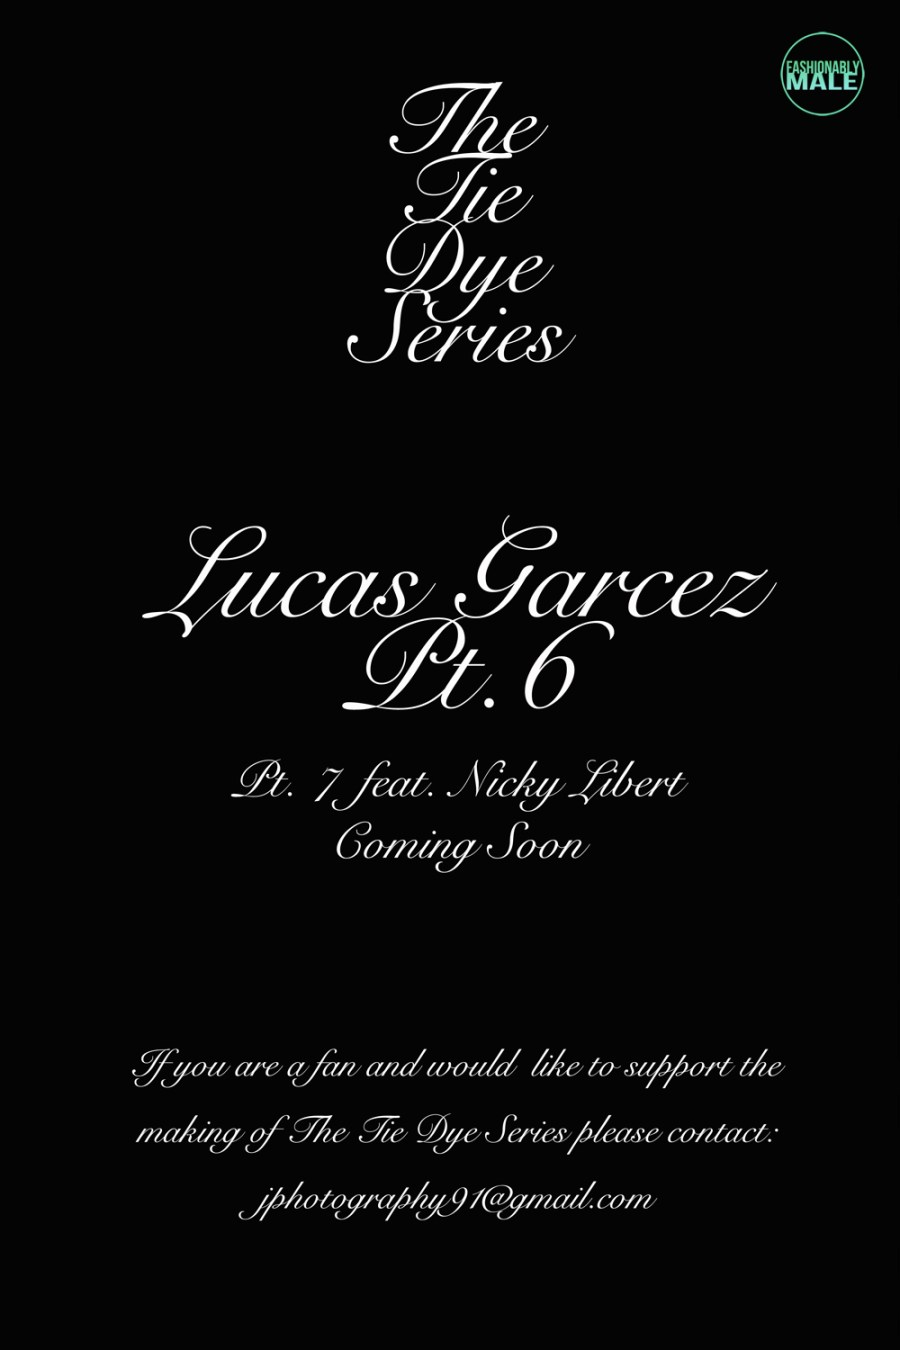 Jose Pope_Tie Dye Series_Lucas Garcez_02